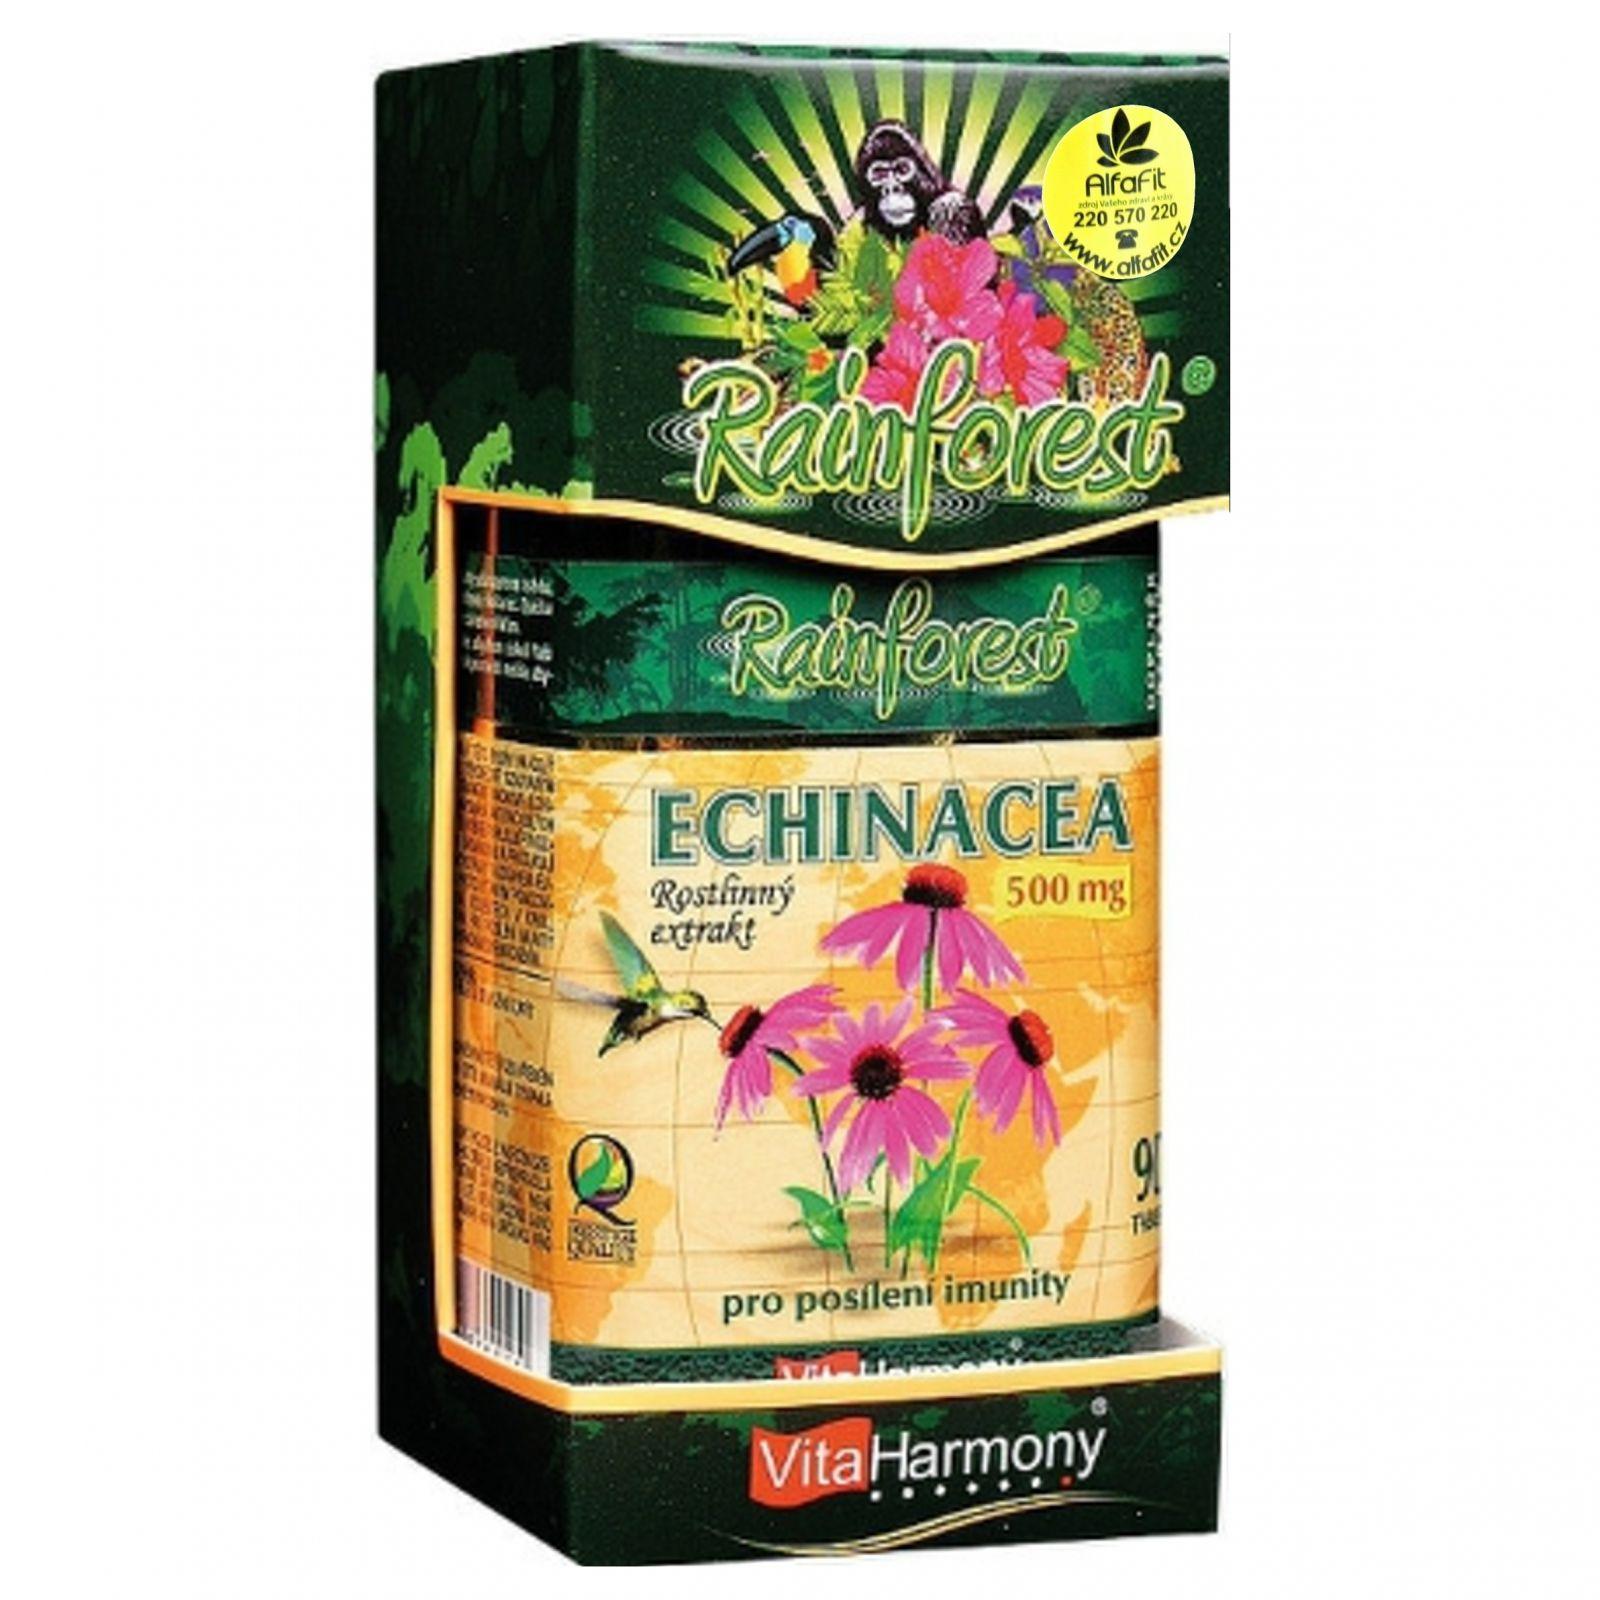 VitaHarmony Echinacea 500 mg - 90 tablet